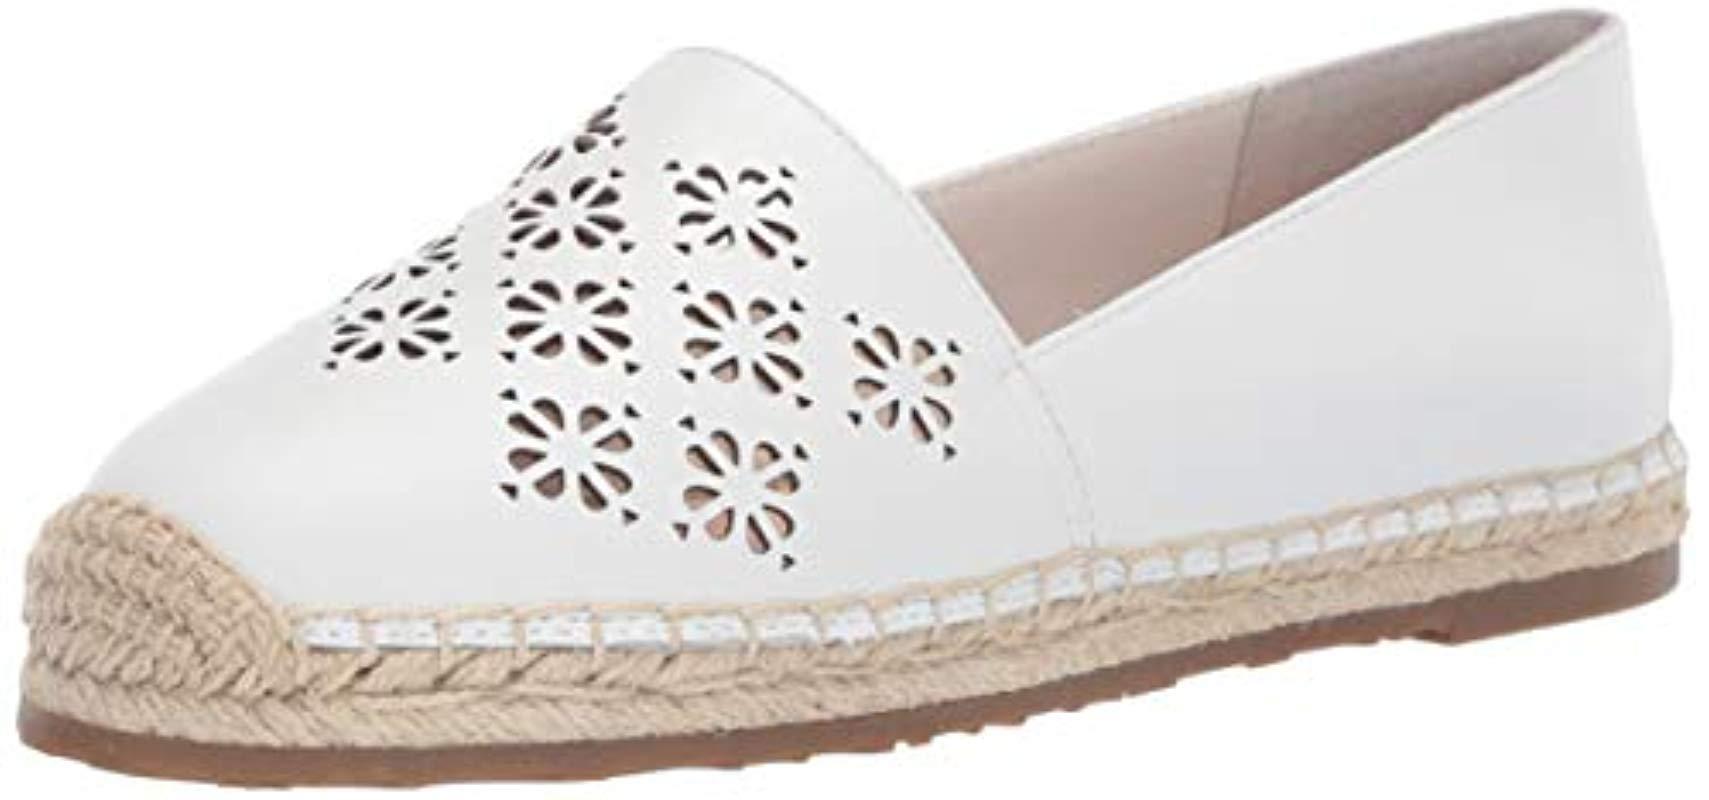 0247c81a437 Lyst - Kate Spade Garcia Espadrille Wedge Sandal in White